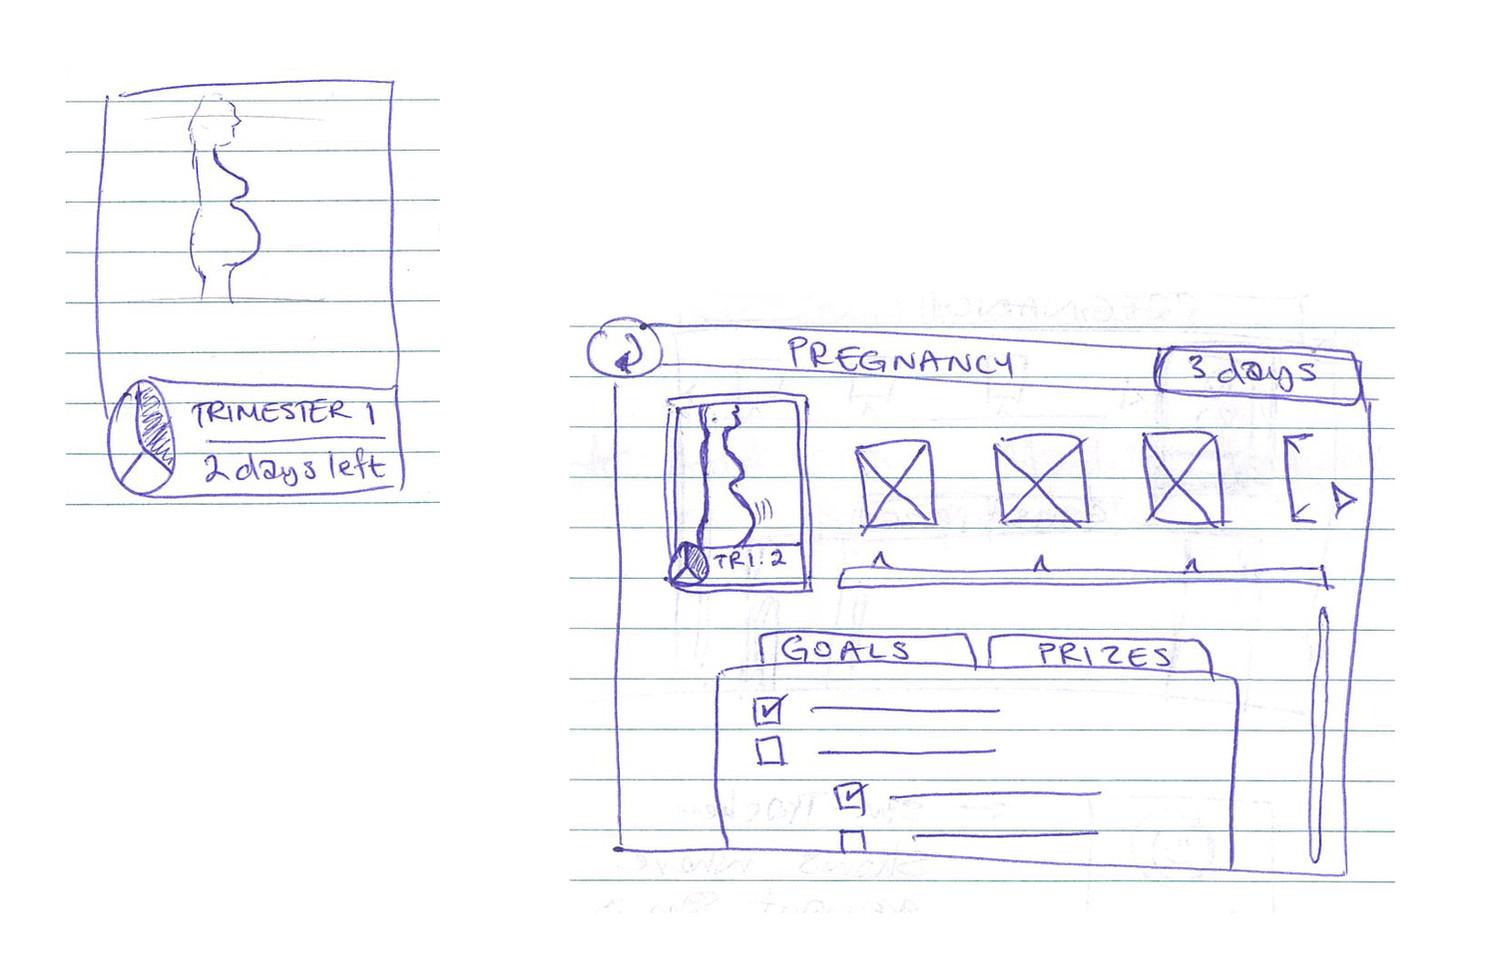 preg_sketches.jpg